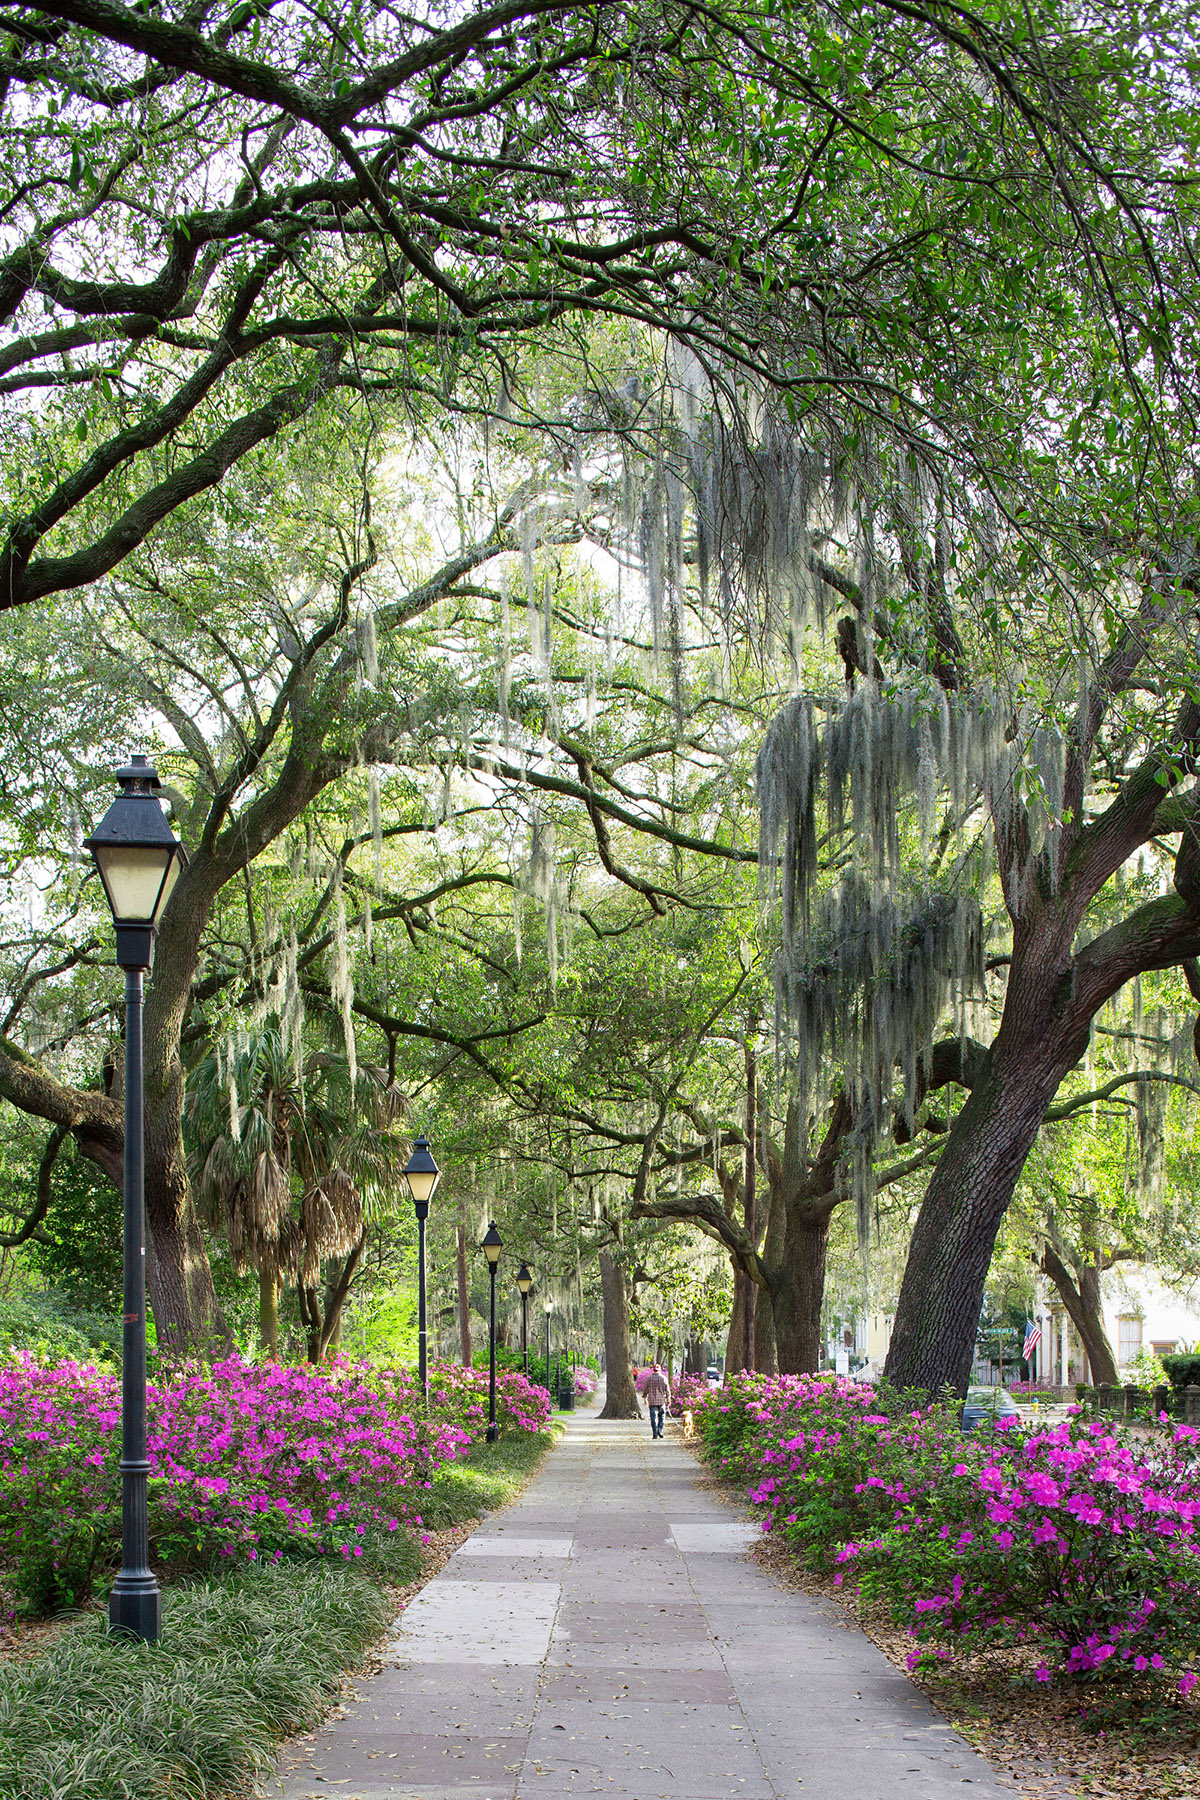 savannah walkway with trees and flowers